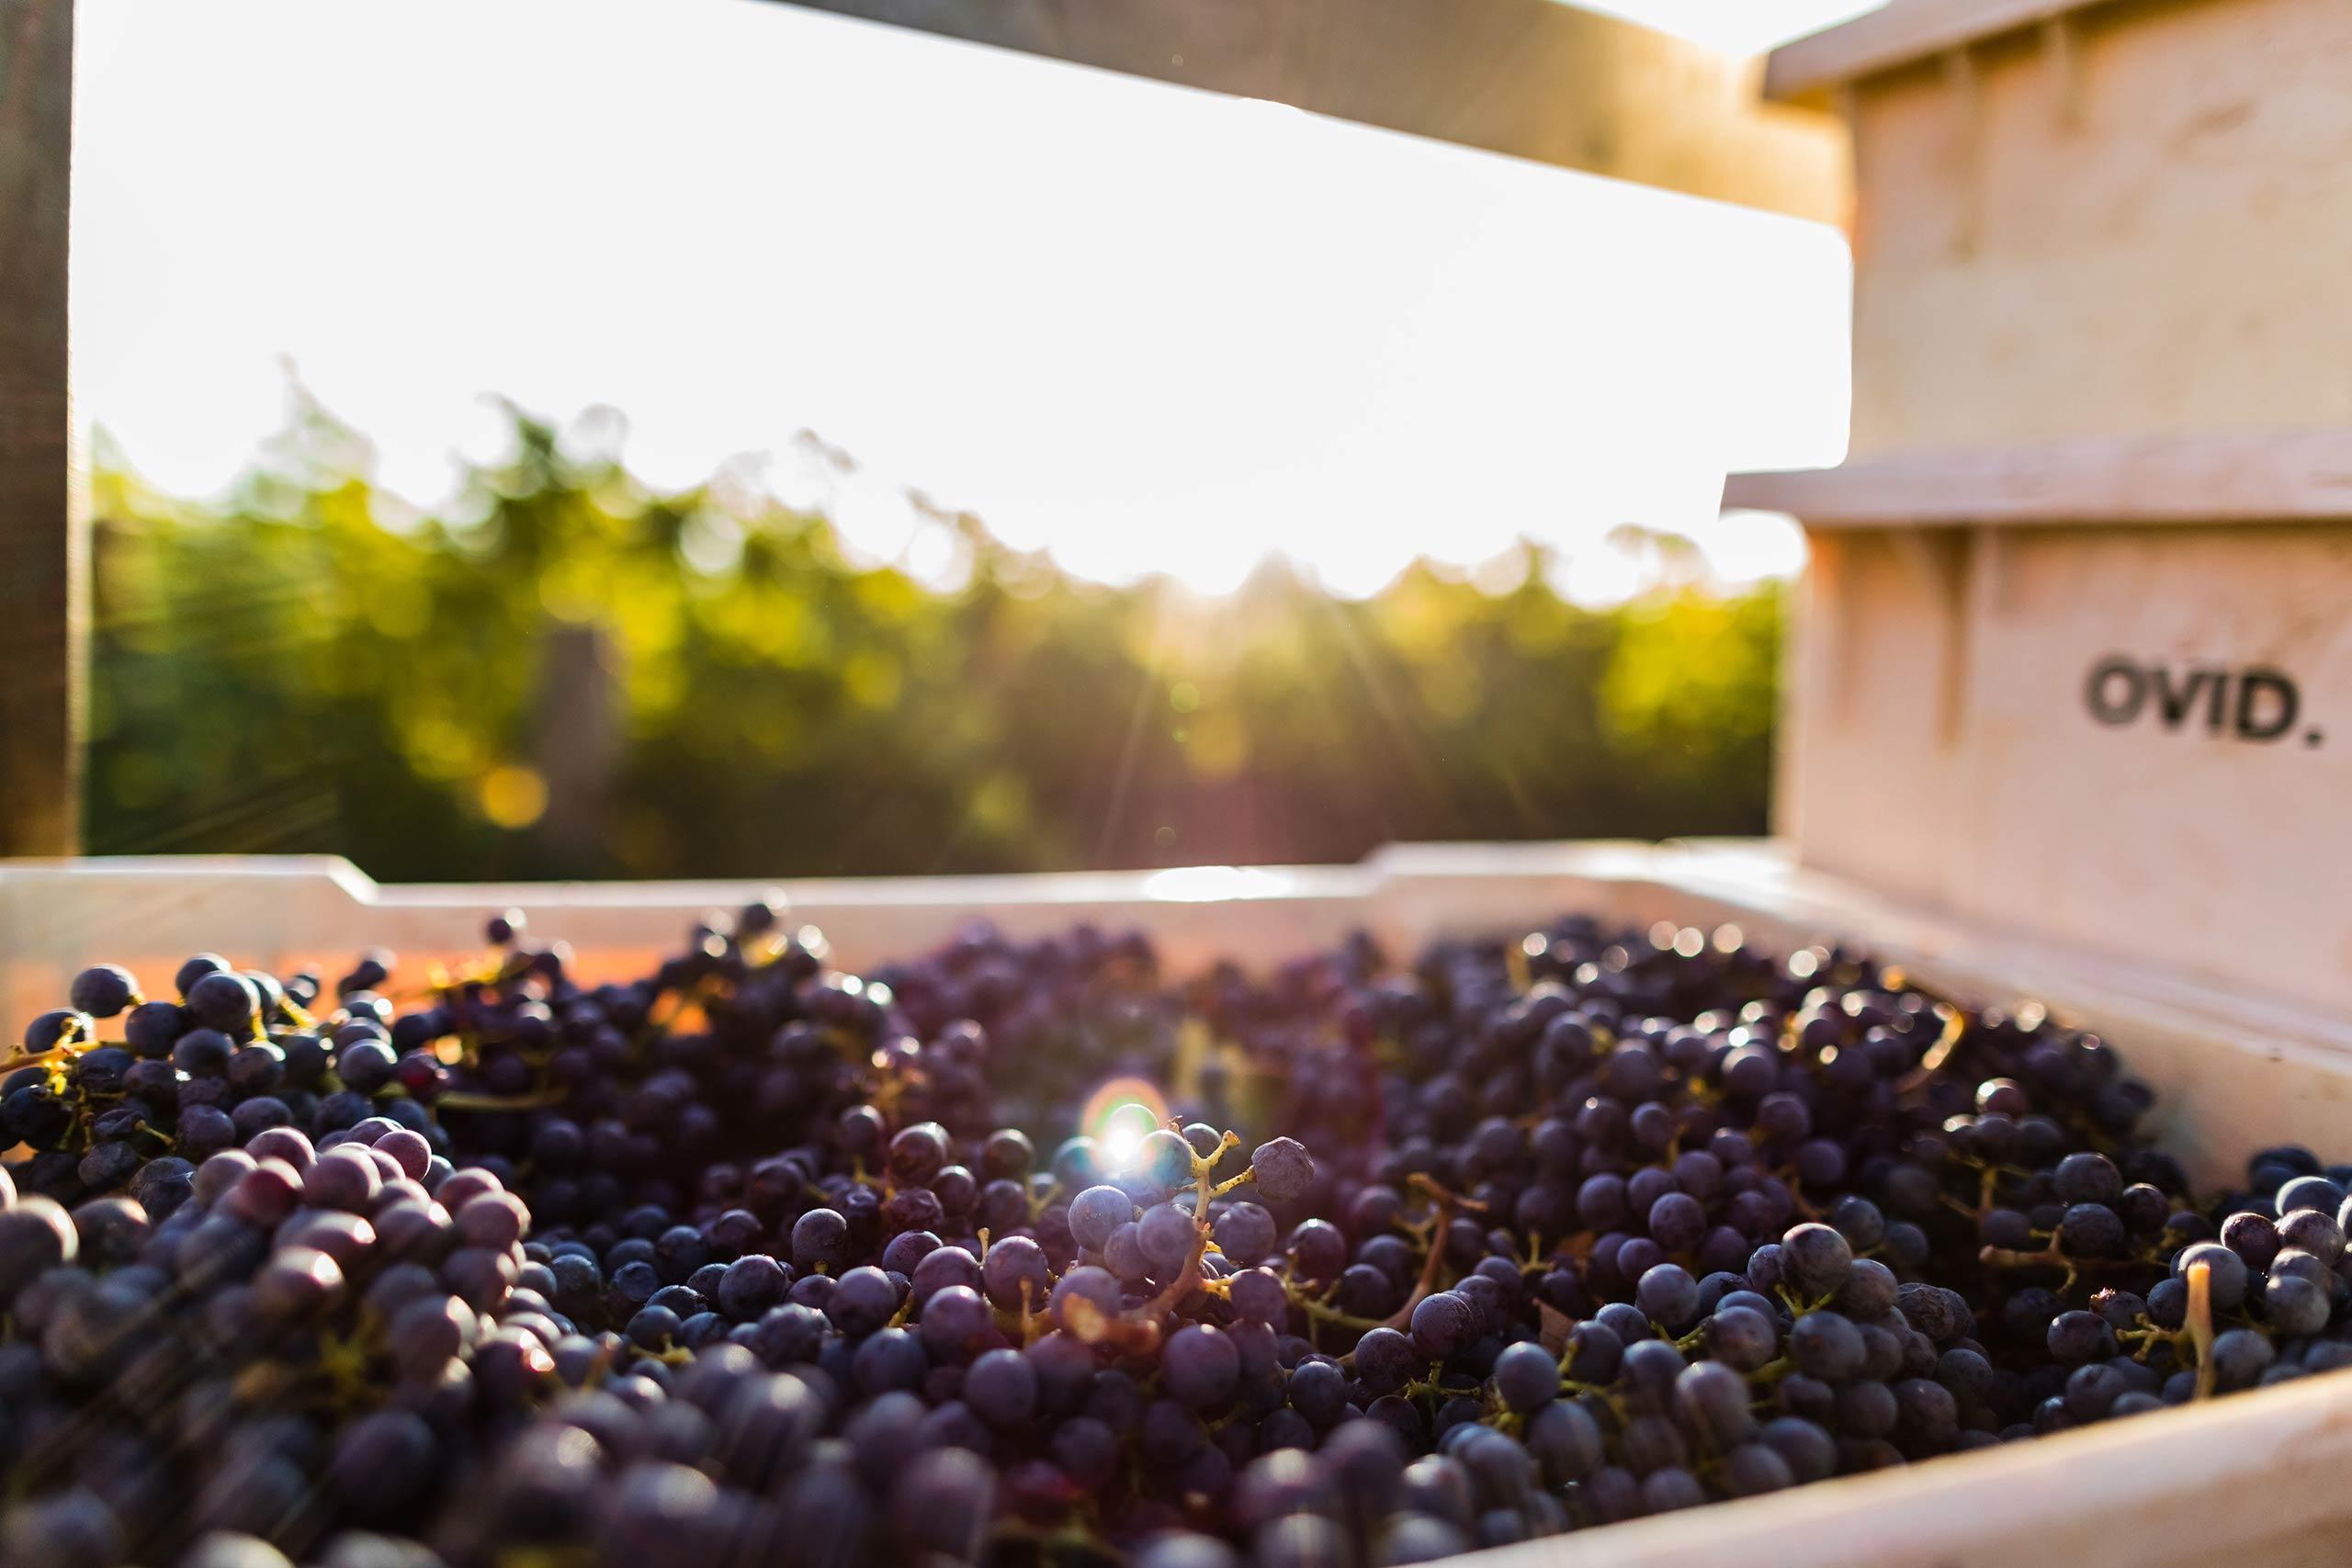 Harvested bin of grapes